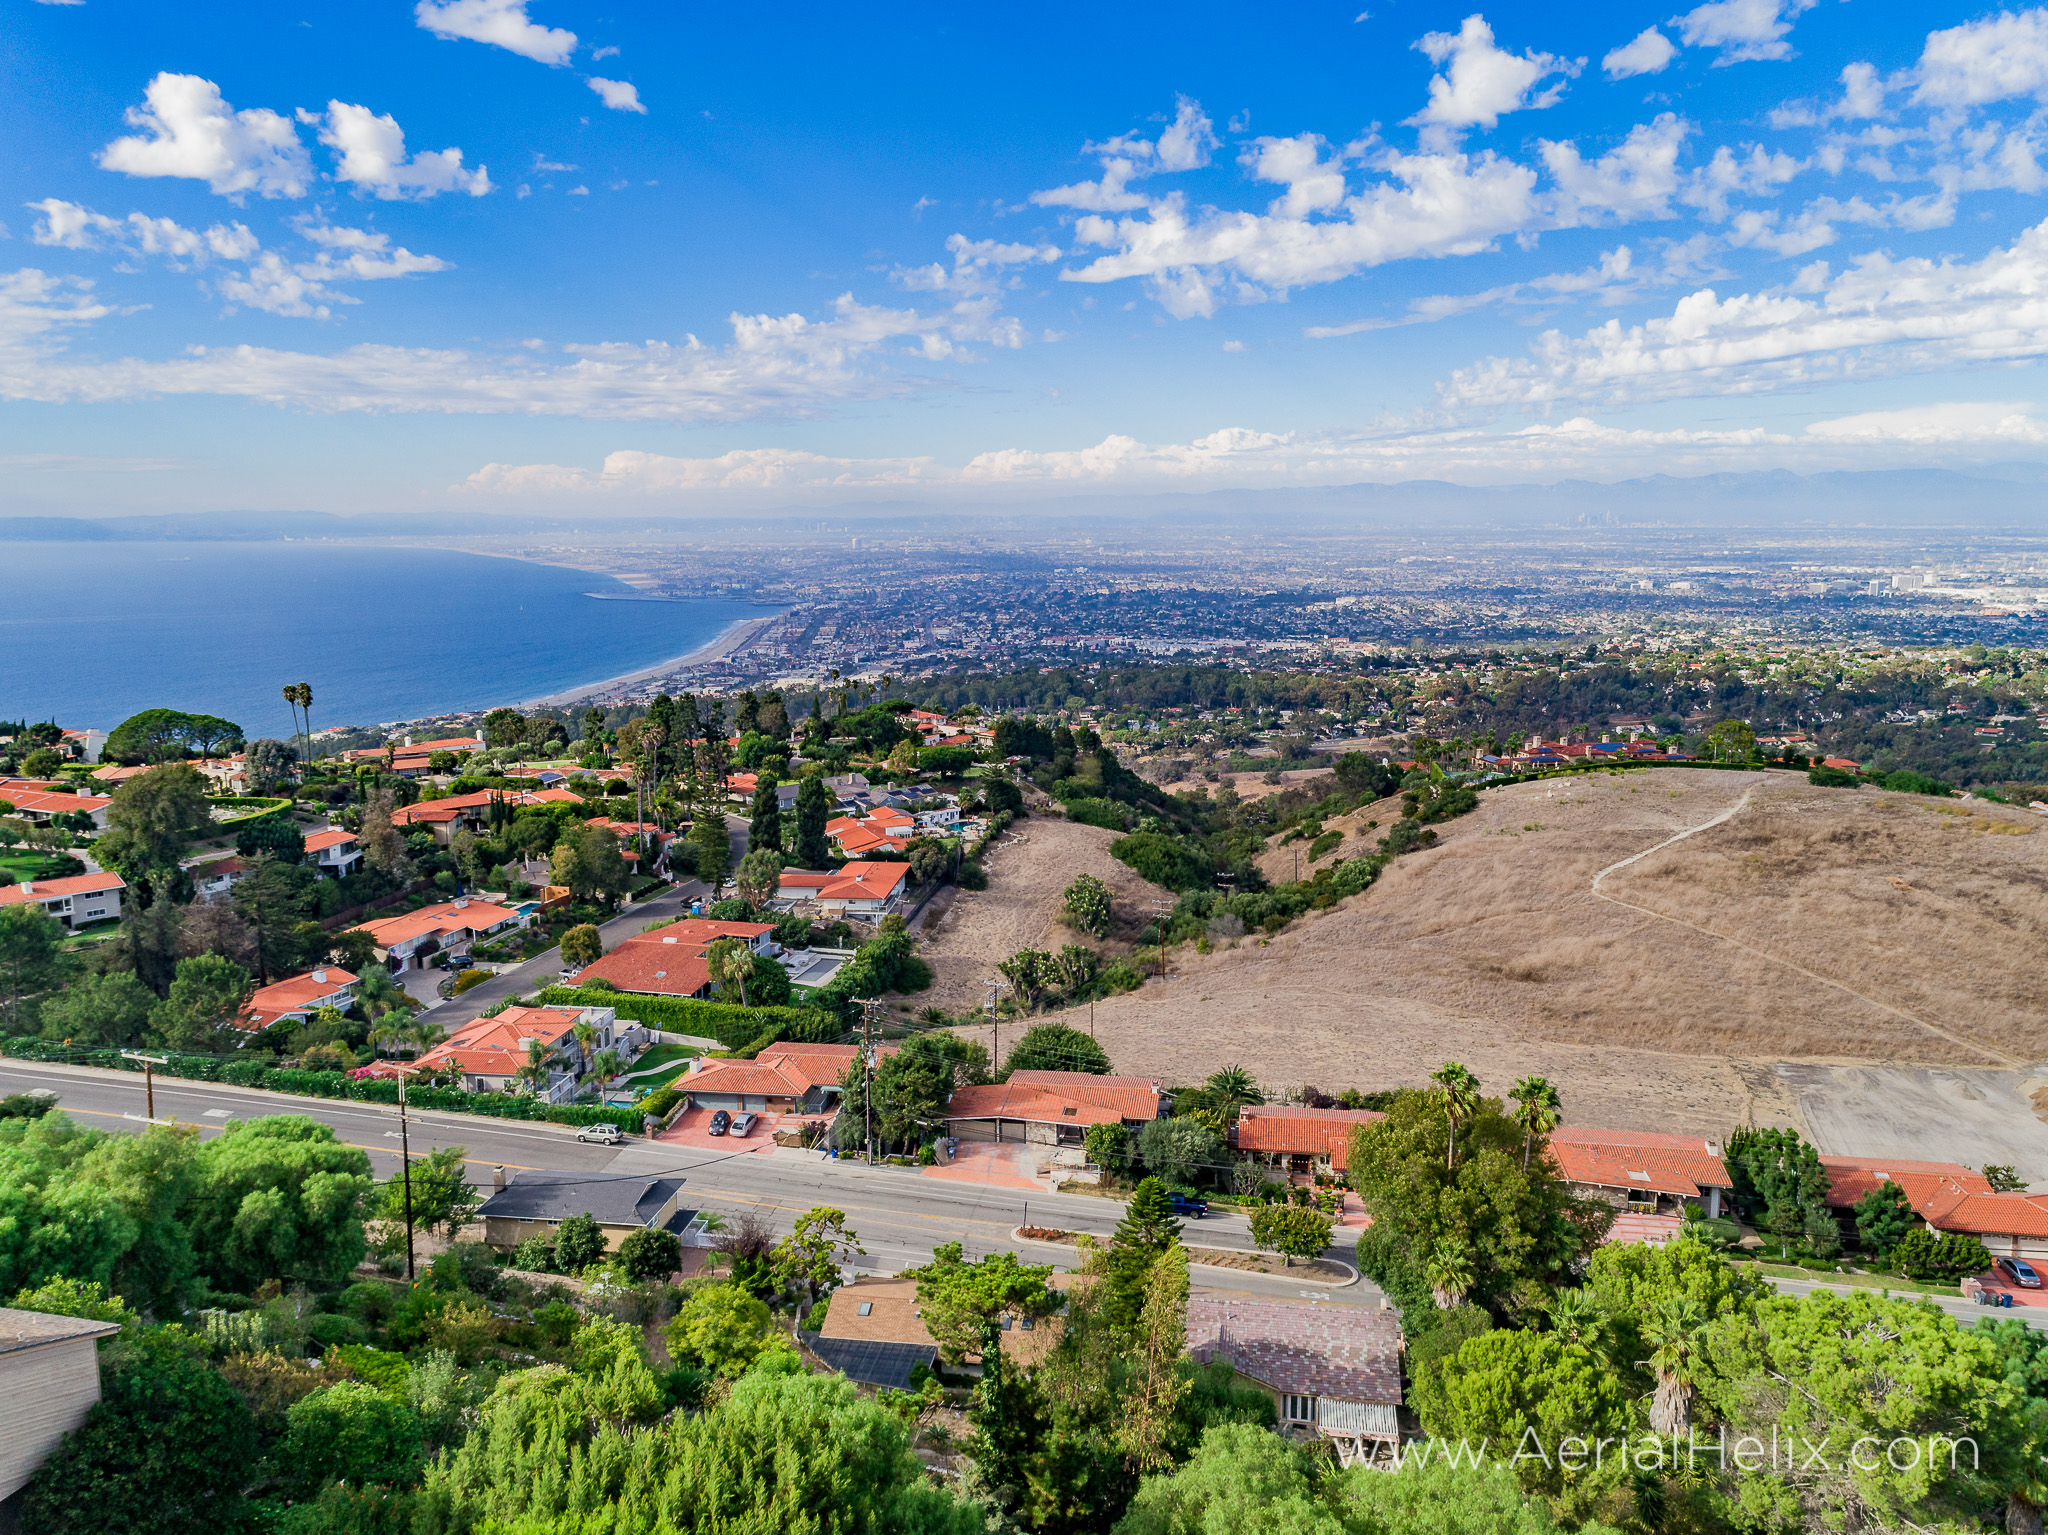 Woodfern Drive - HELIX Real Estate Aerial Photographer-17.jpg